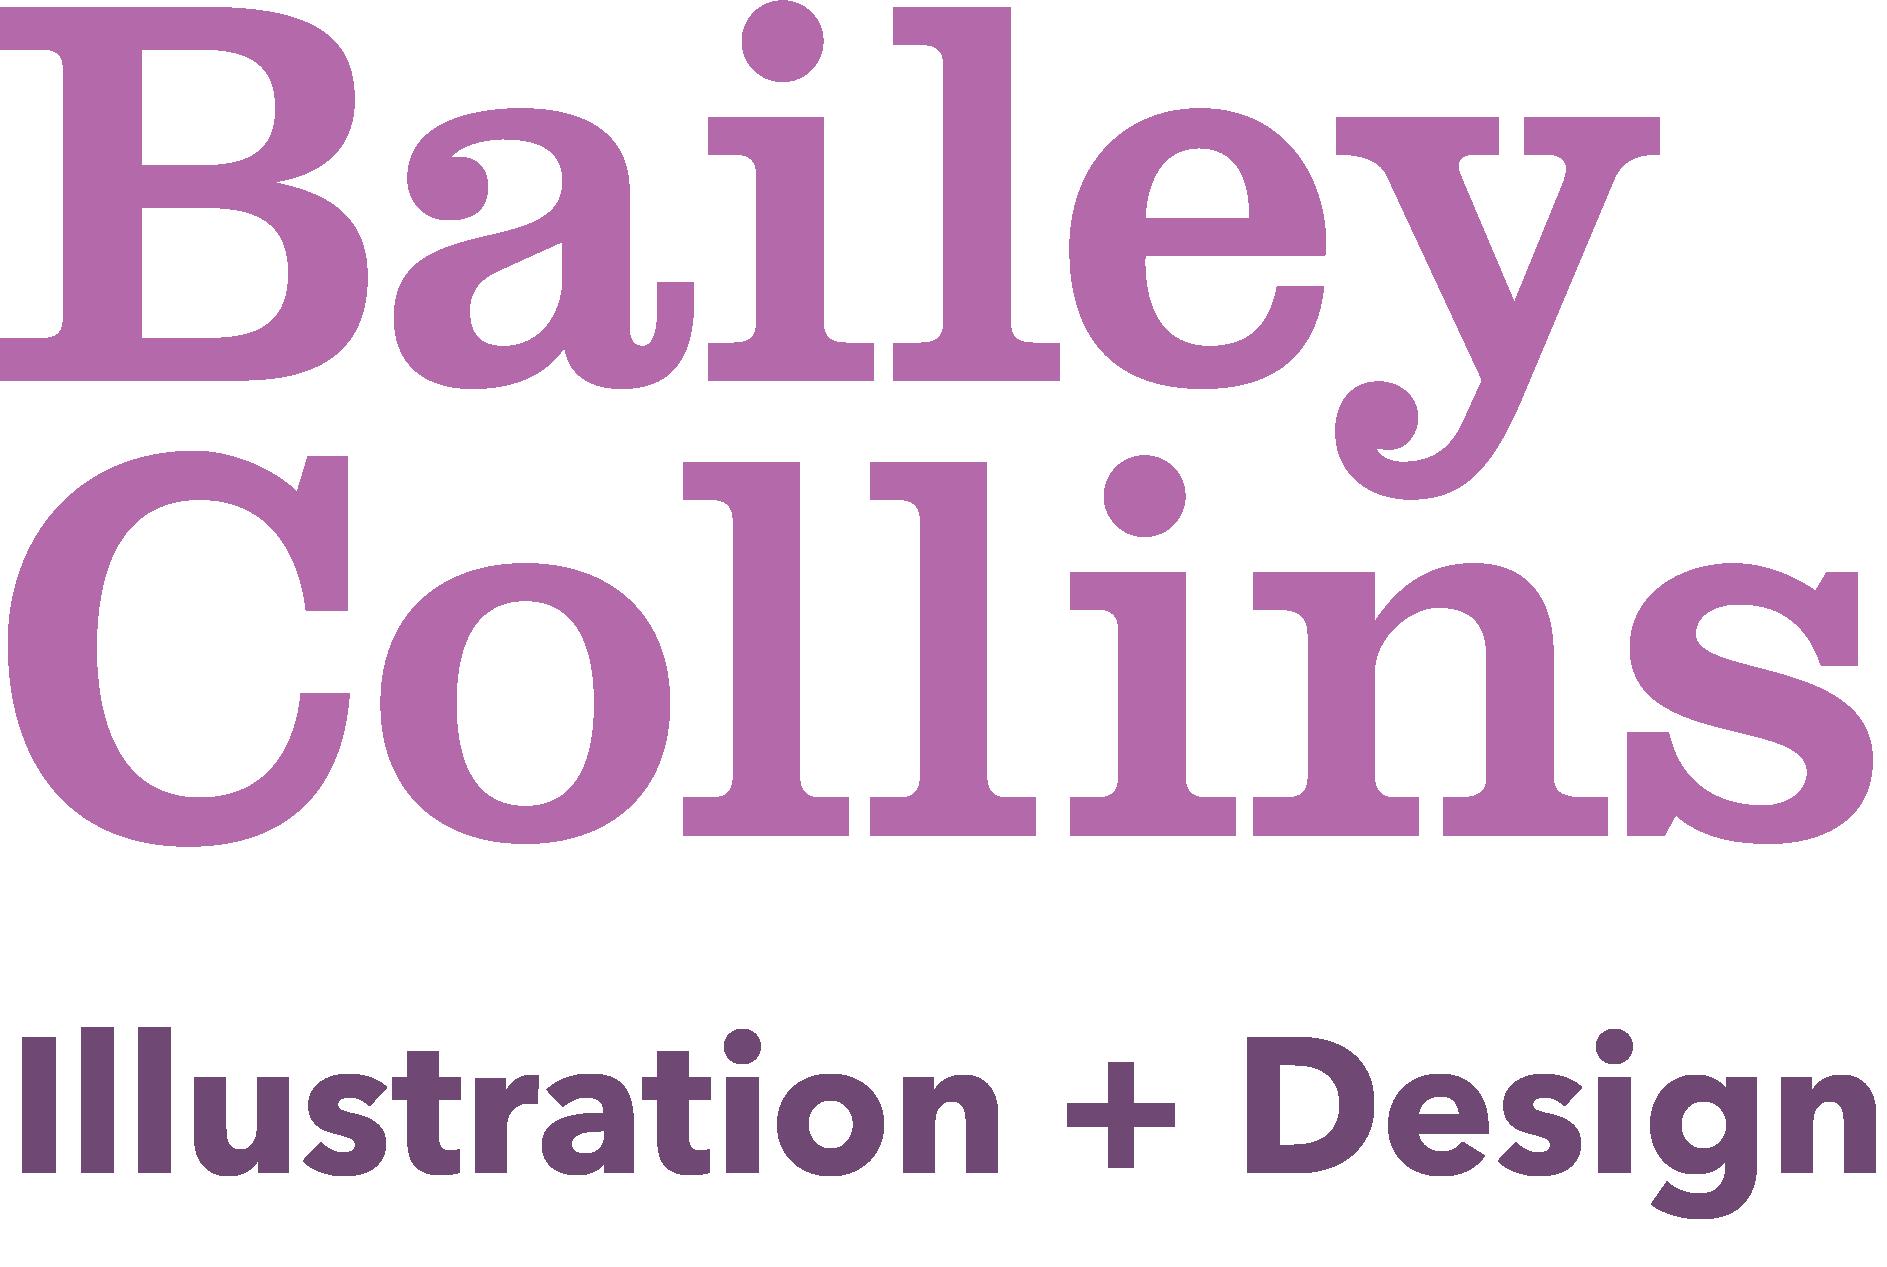 Bailey Collins